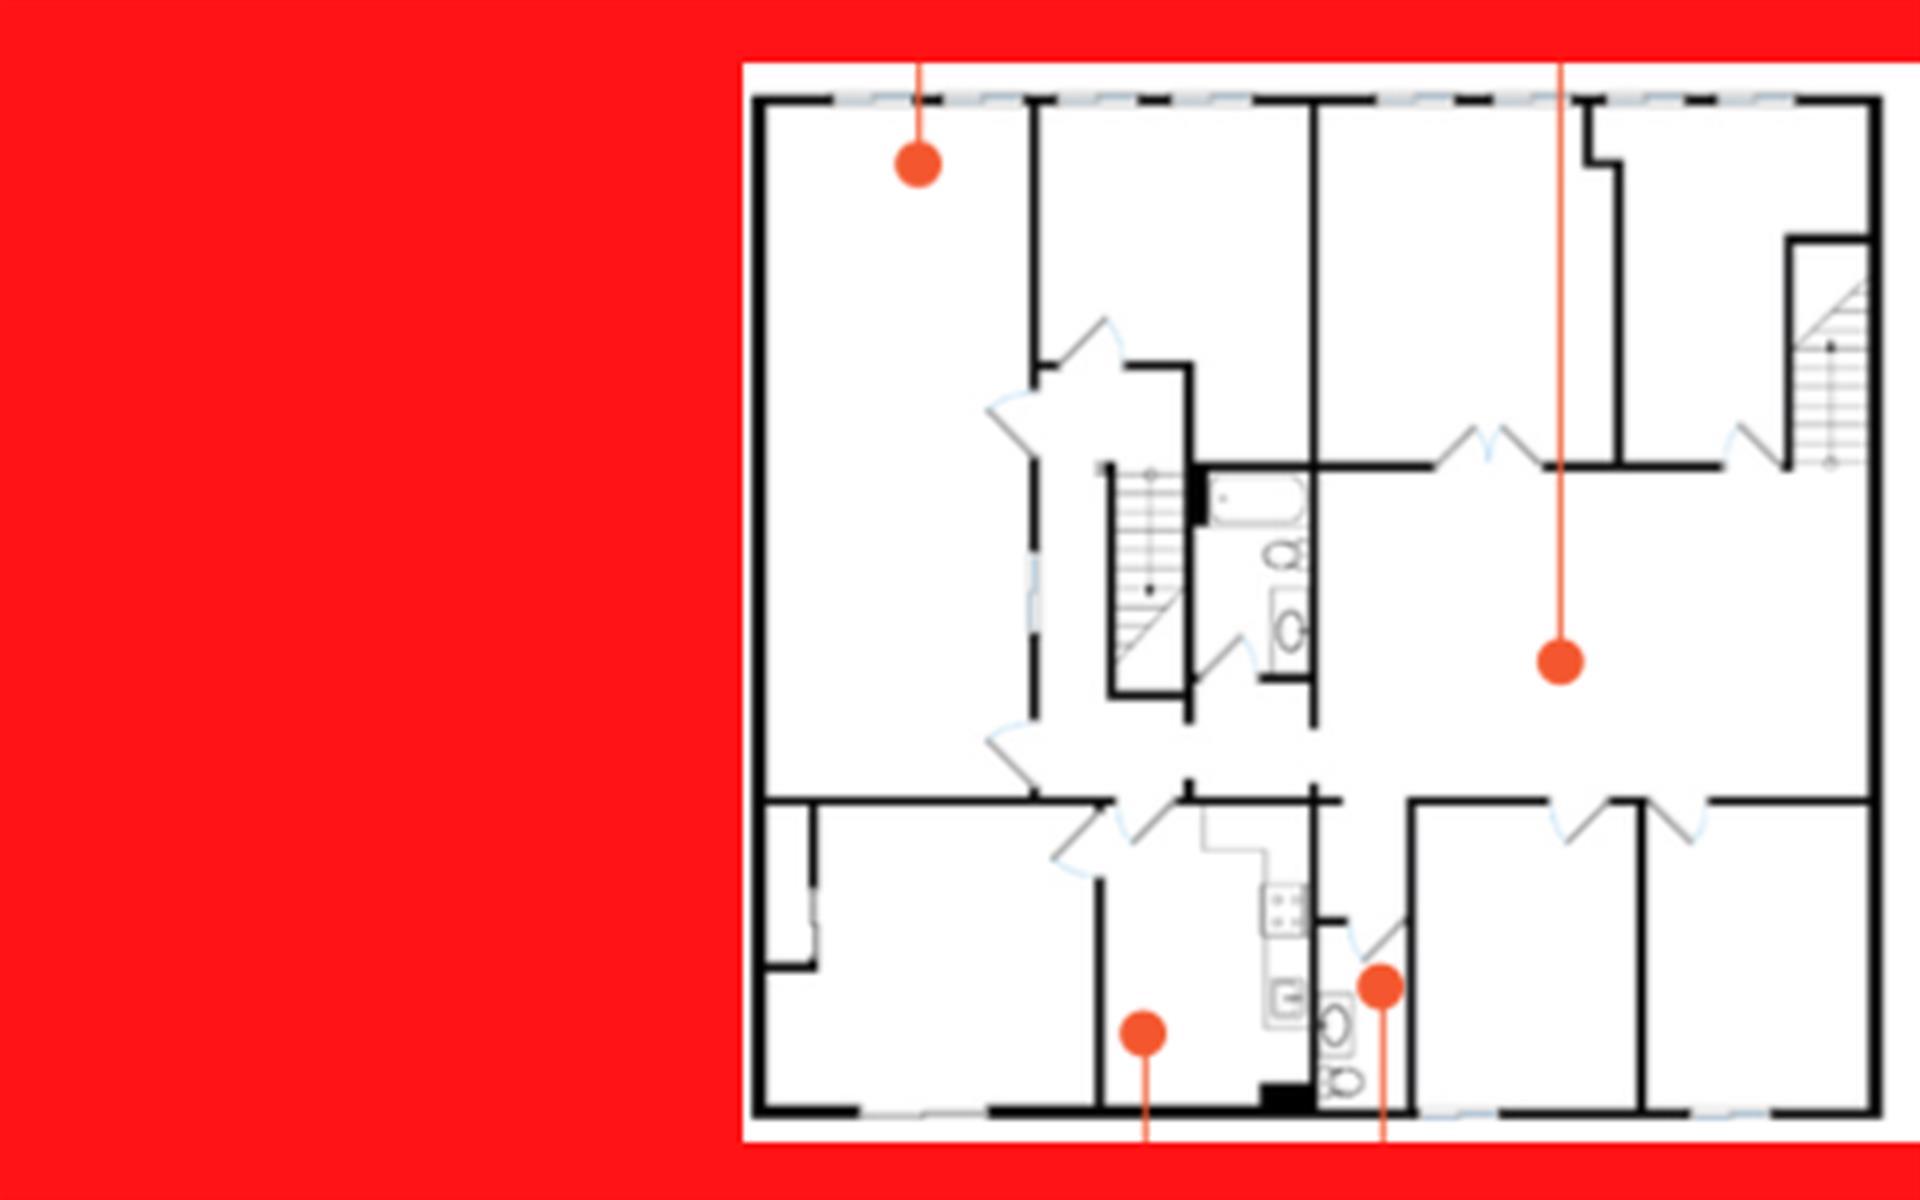 PINKKIWIBRAIN - Whole Floor (Monthly) - Unfurnished